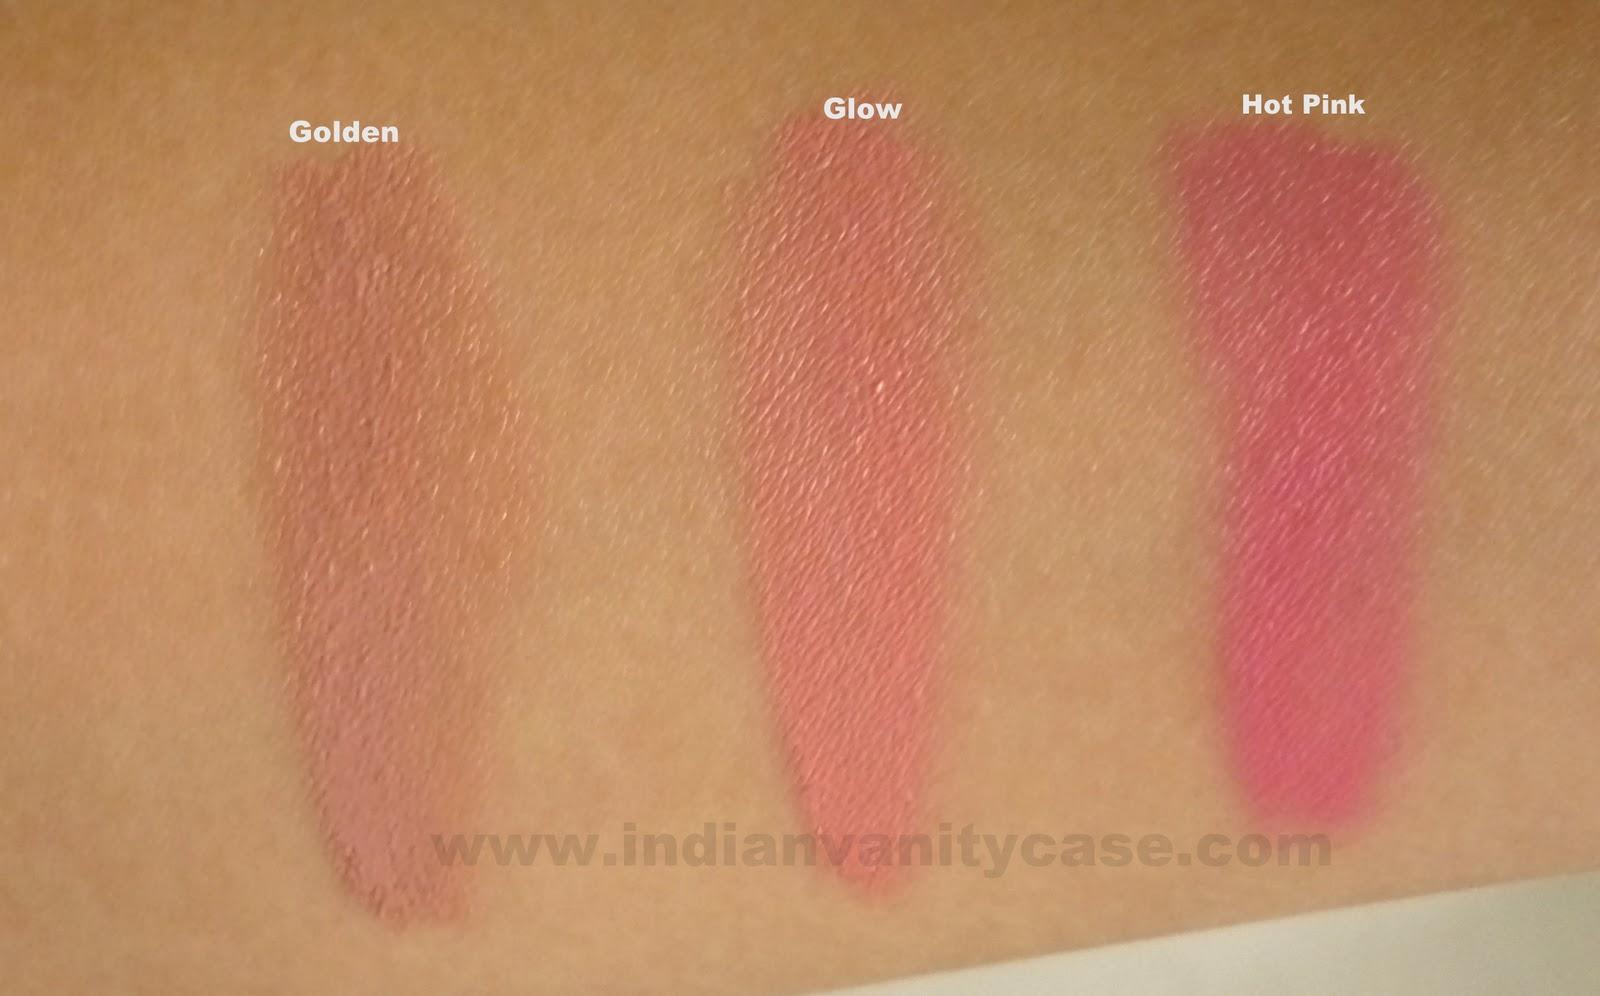 Indian Vanity Case Nyx Rouge Cream Blushes Photos Swatches